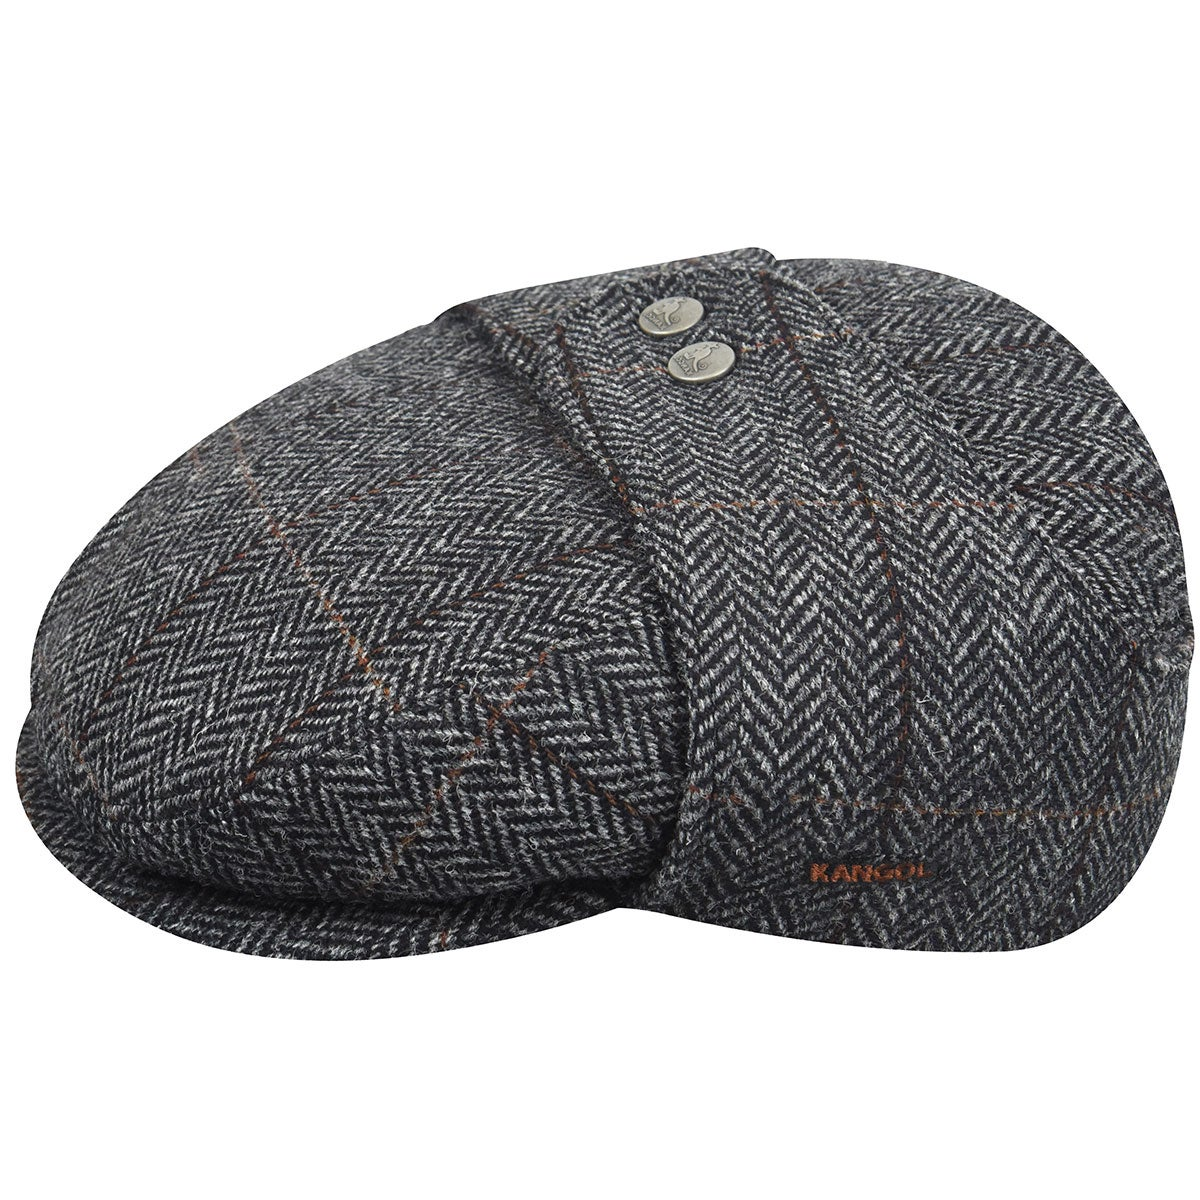 Tweed_Bugatti_Cap